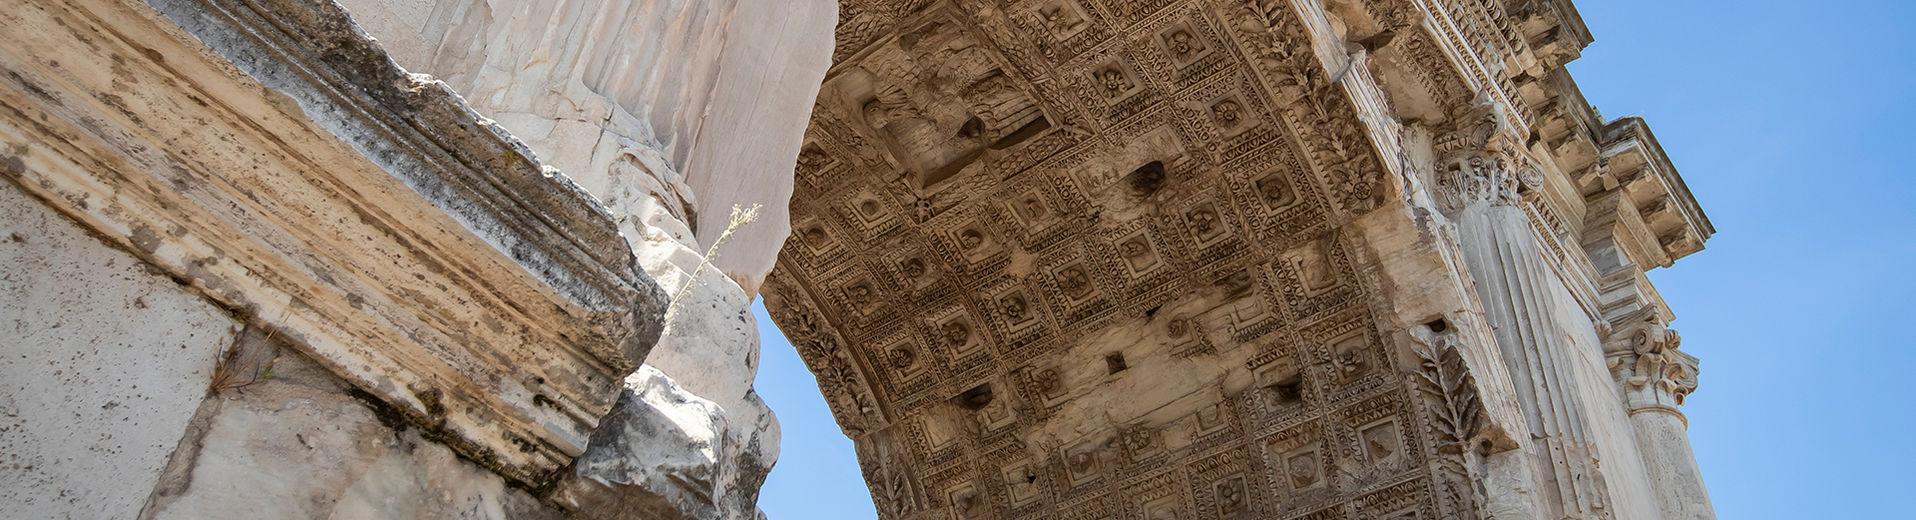 Roman arch seen from below